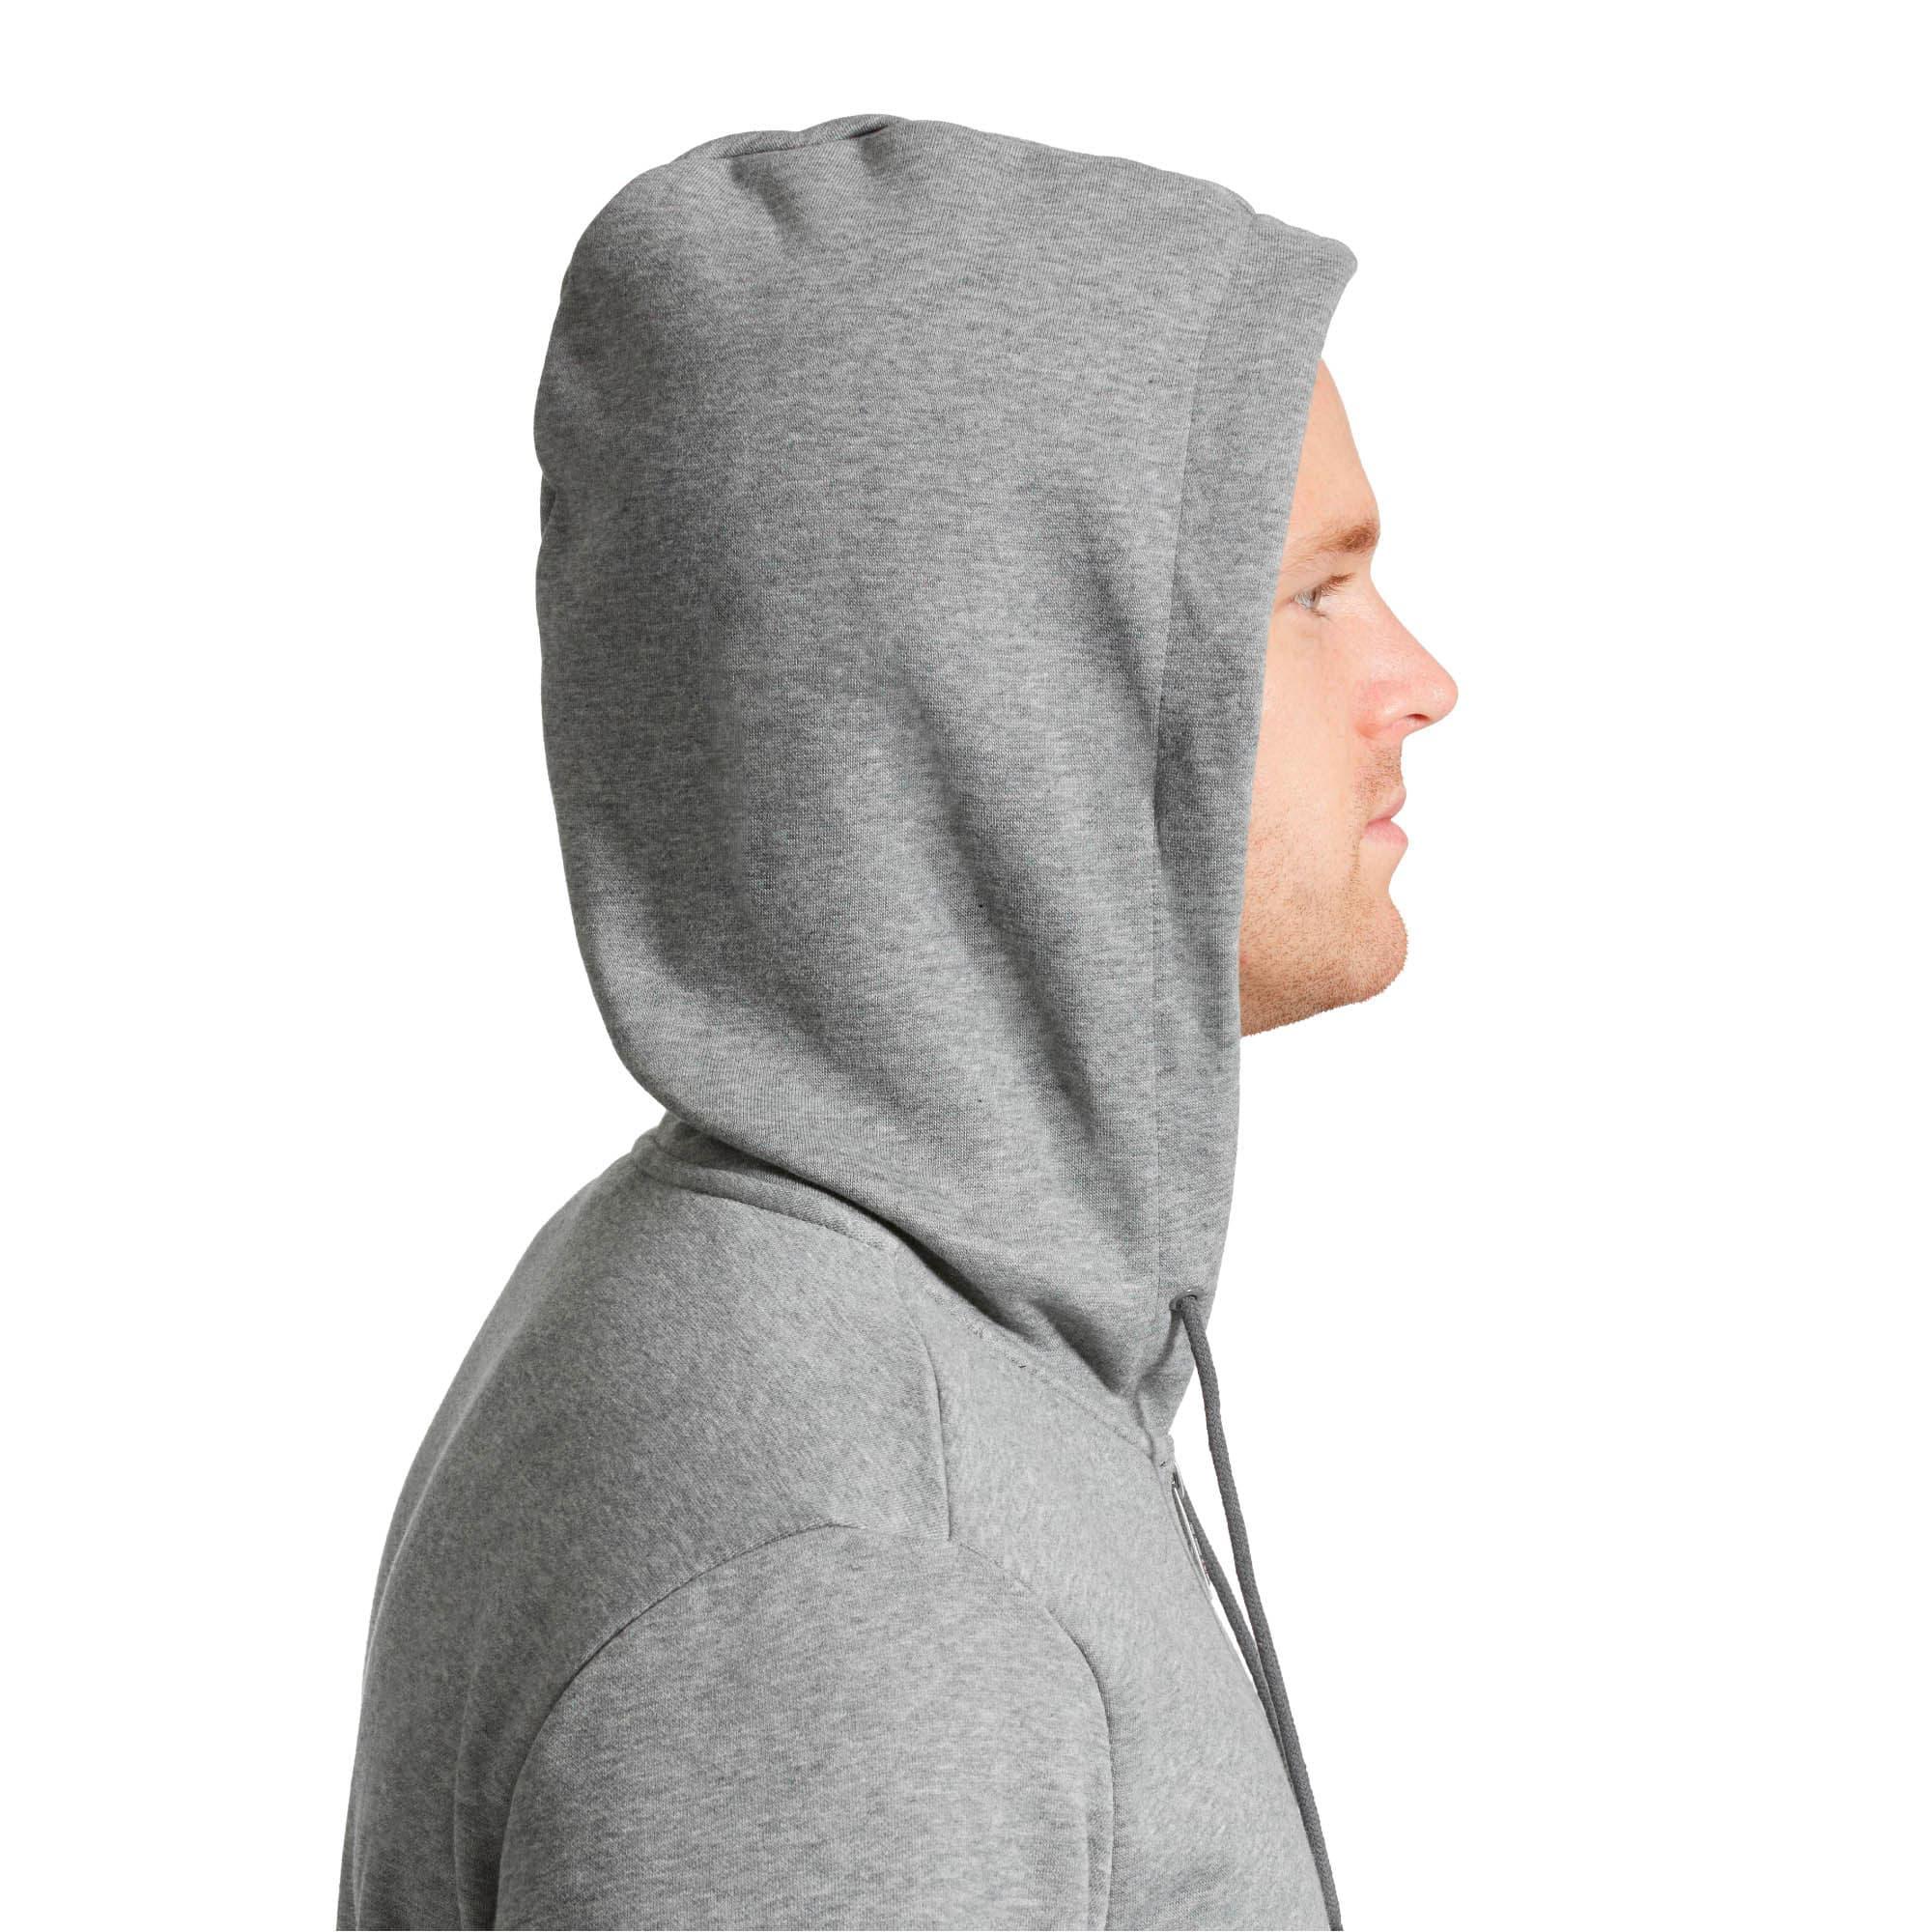 Thumbnail 4 of Essentials Men's Hooded Fleece Jacket, Medium Gray Heather, medium